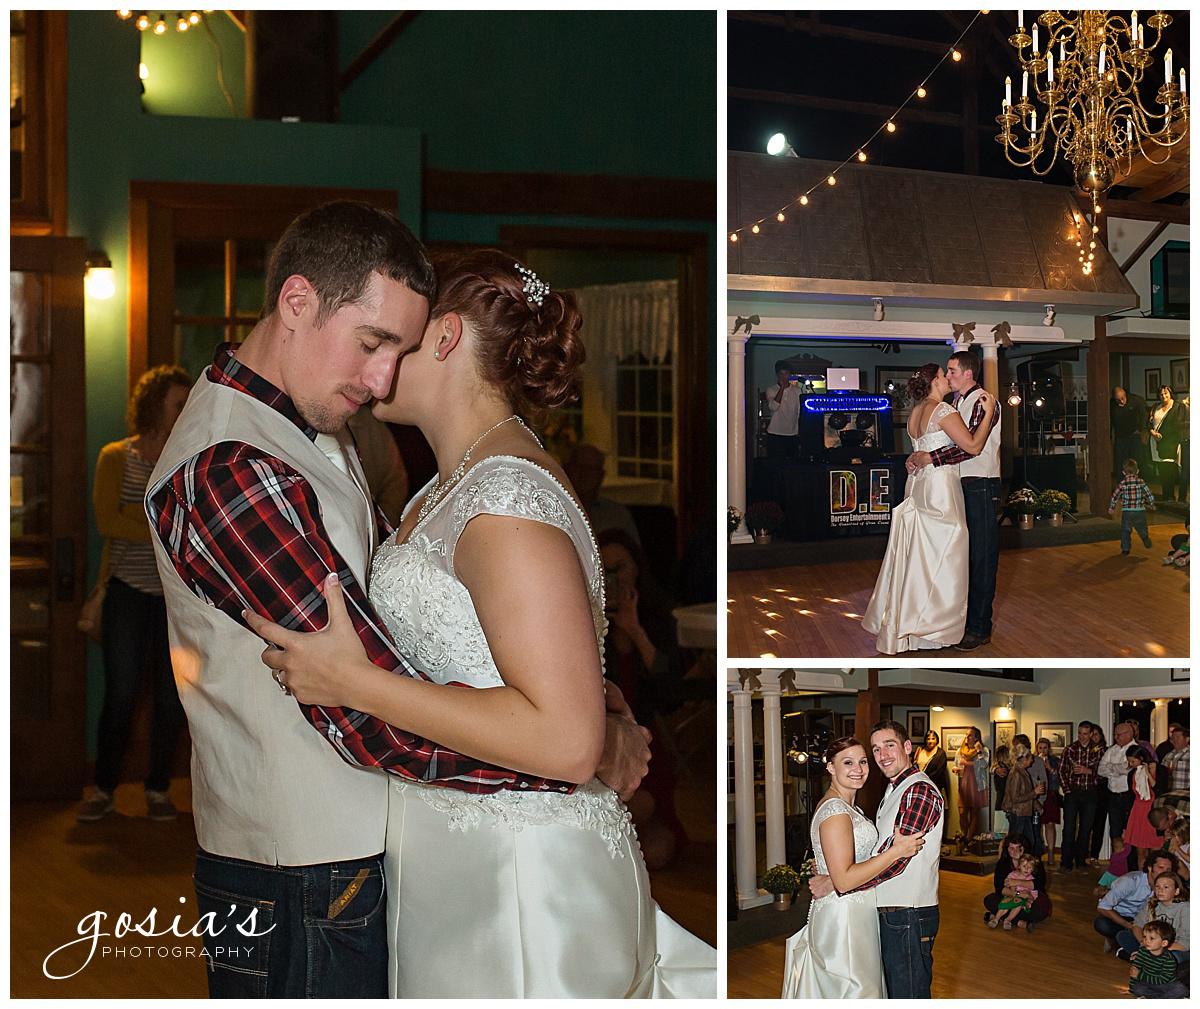 Gosias-Photography-wedding-photographer-Appleton-Homestead-Meadows-outdoor-ceremony-reception-Rachel-Zach-_0038.jpg